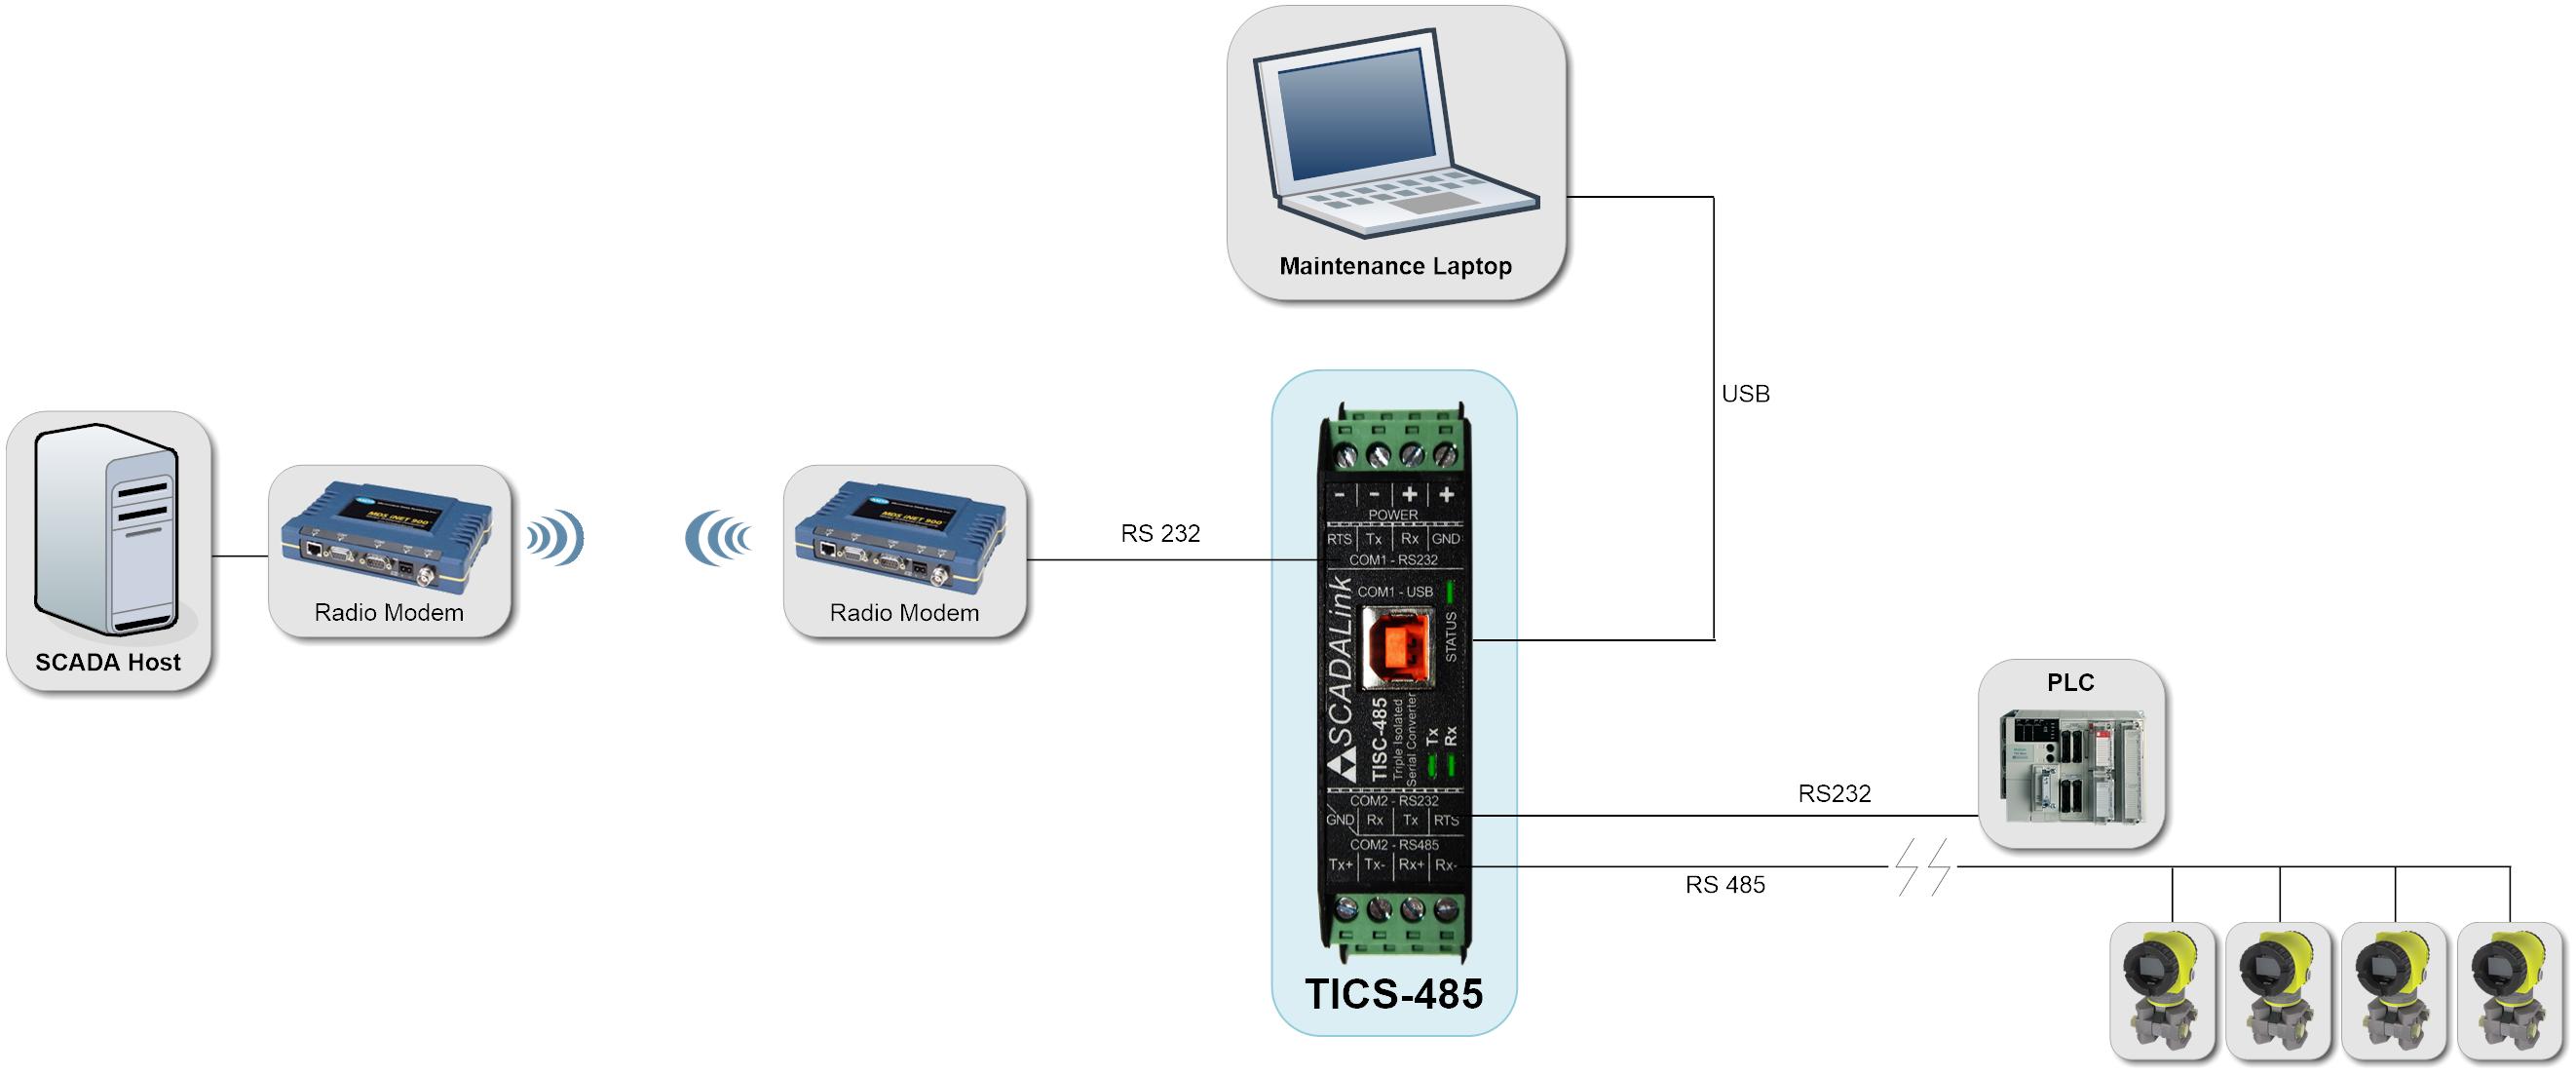 Opto 22 Wiring Diagram Master Blogs Powerflex 753 Control Modbus Plus Isolator